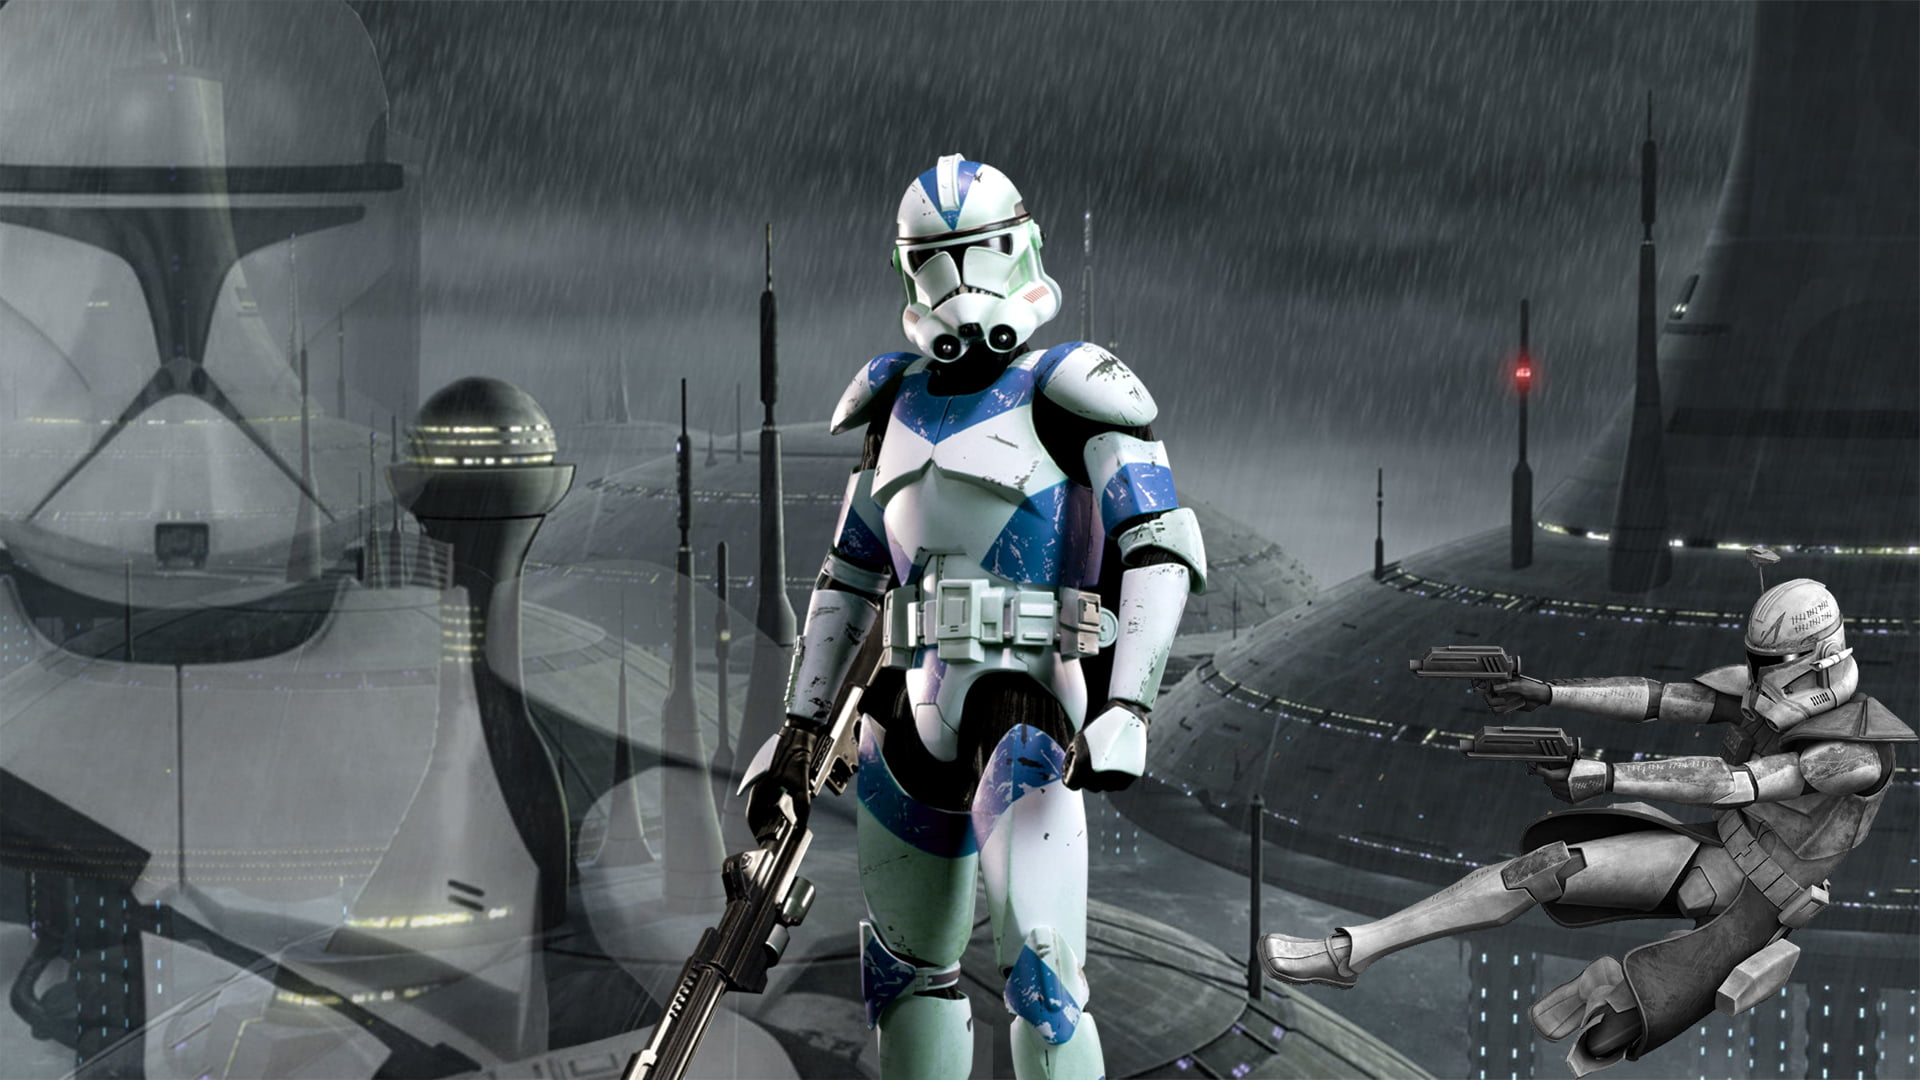 Clone Trooper Wallpaper Hd 1920x1080 Wallpaper Teahub Io